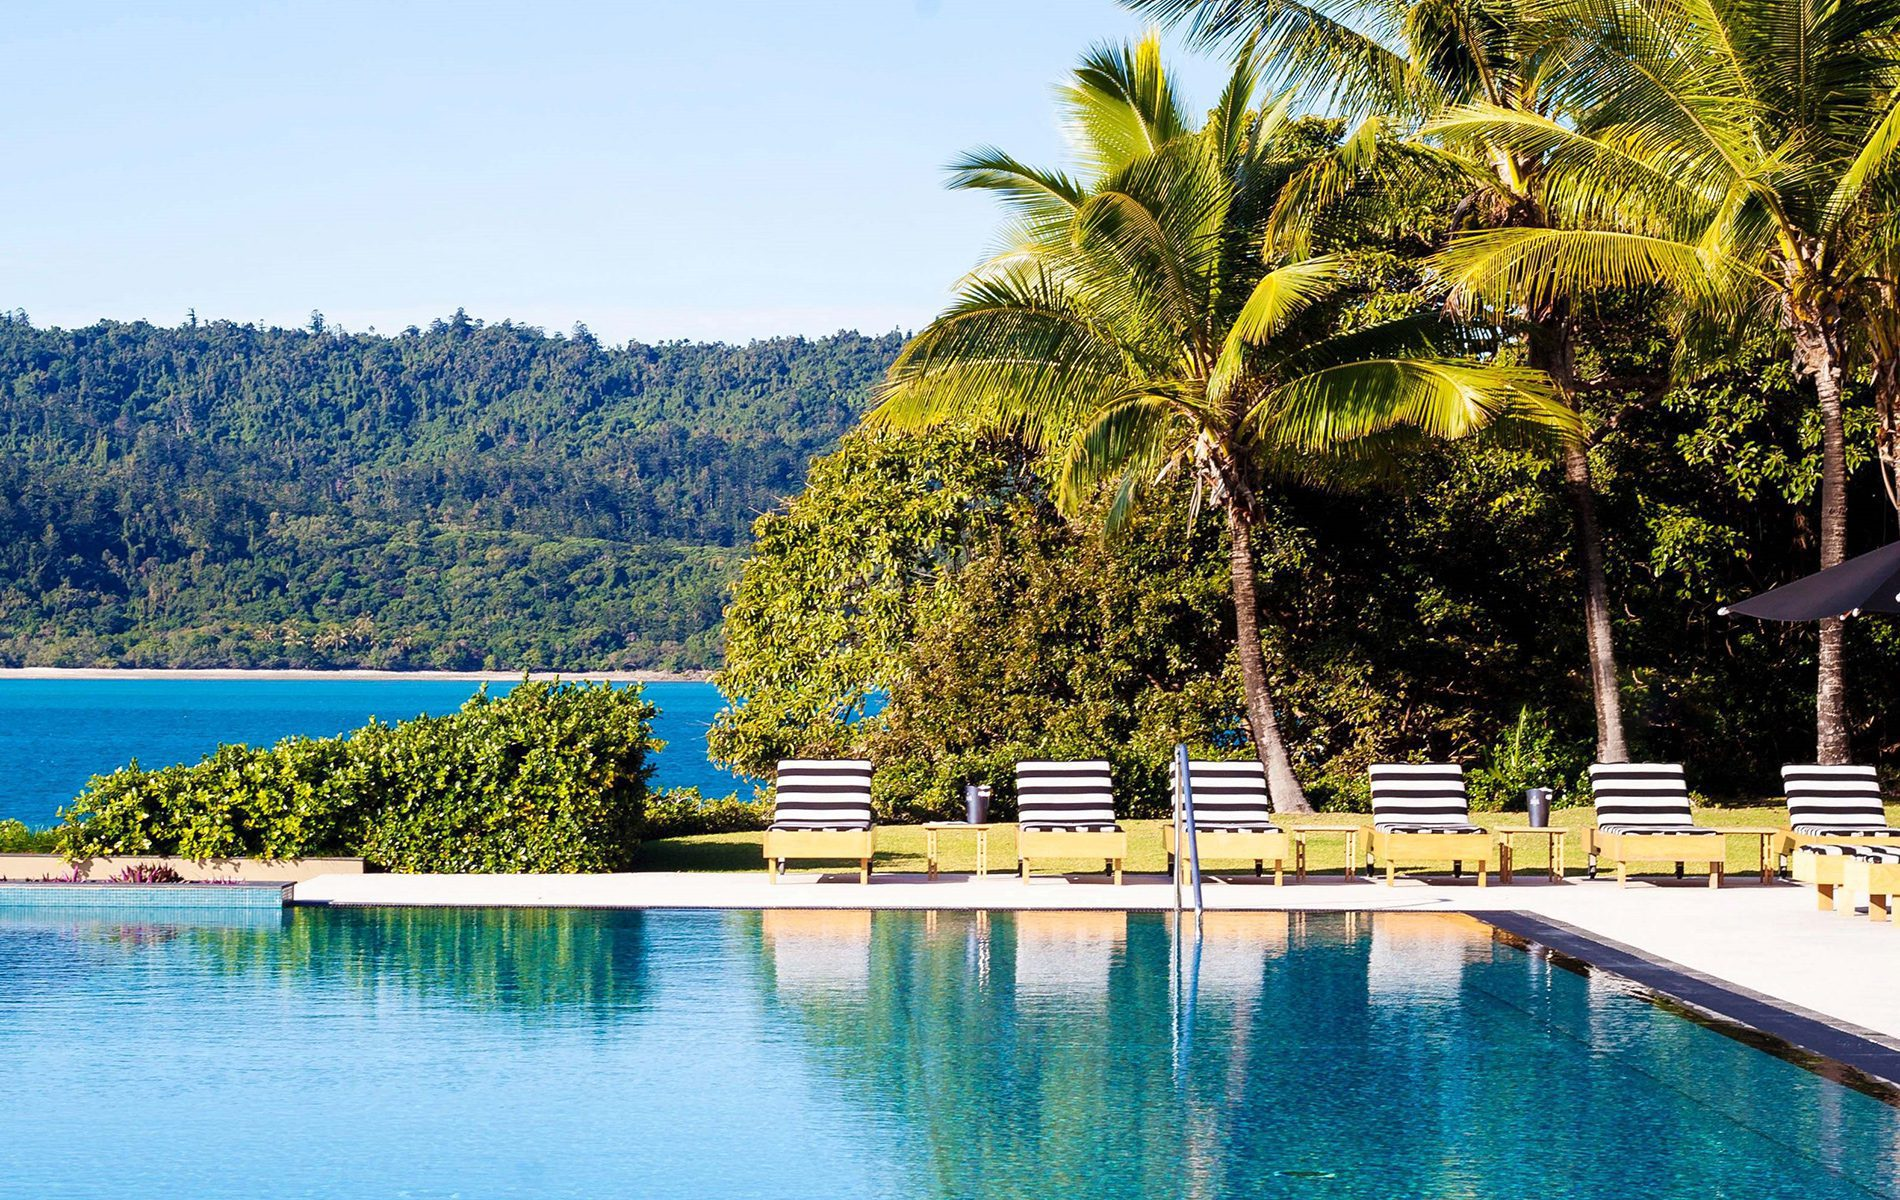 swimming pool overlooking the ocean and palm trees seen on Australia safari